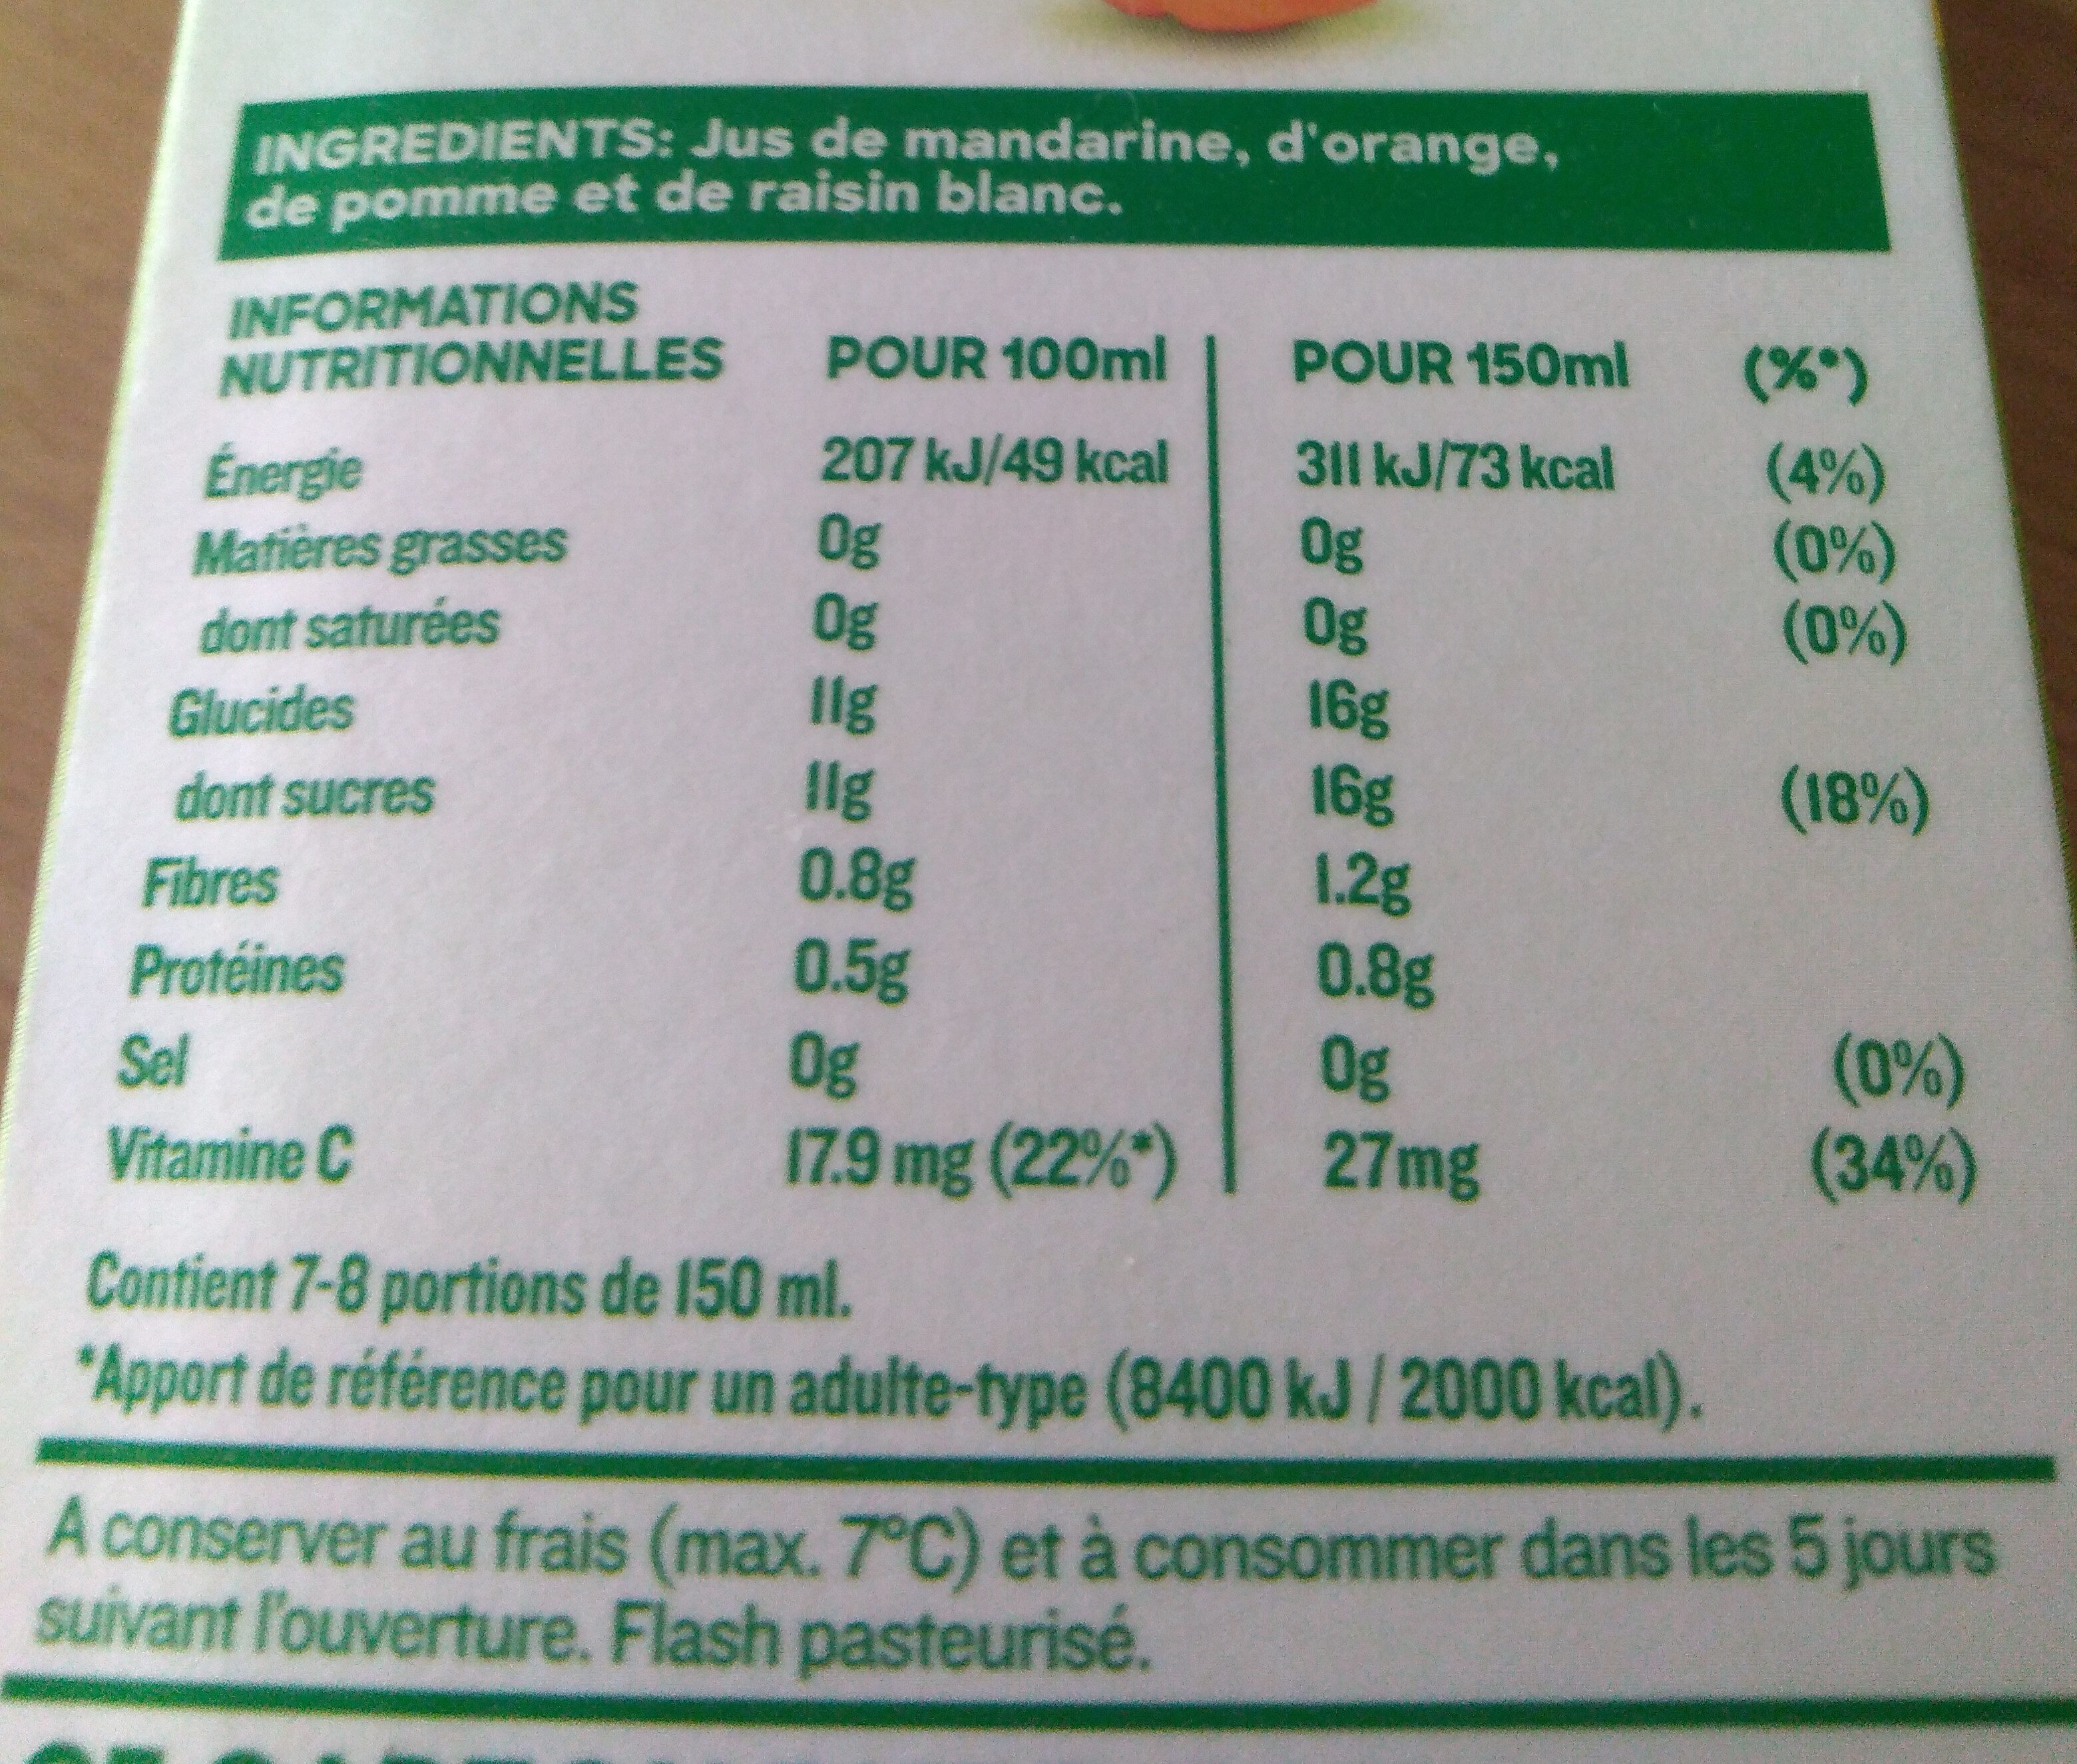 Tropicana pure premium - Nutrition facts